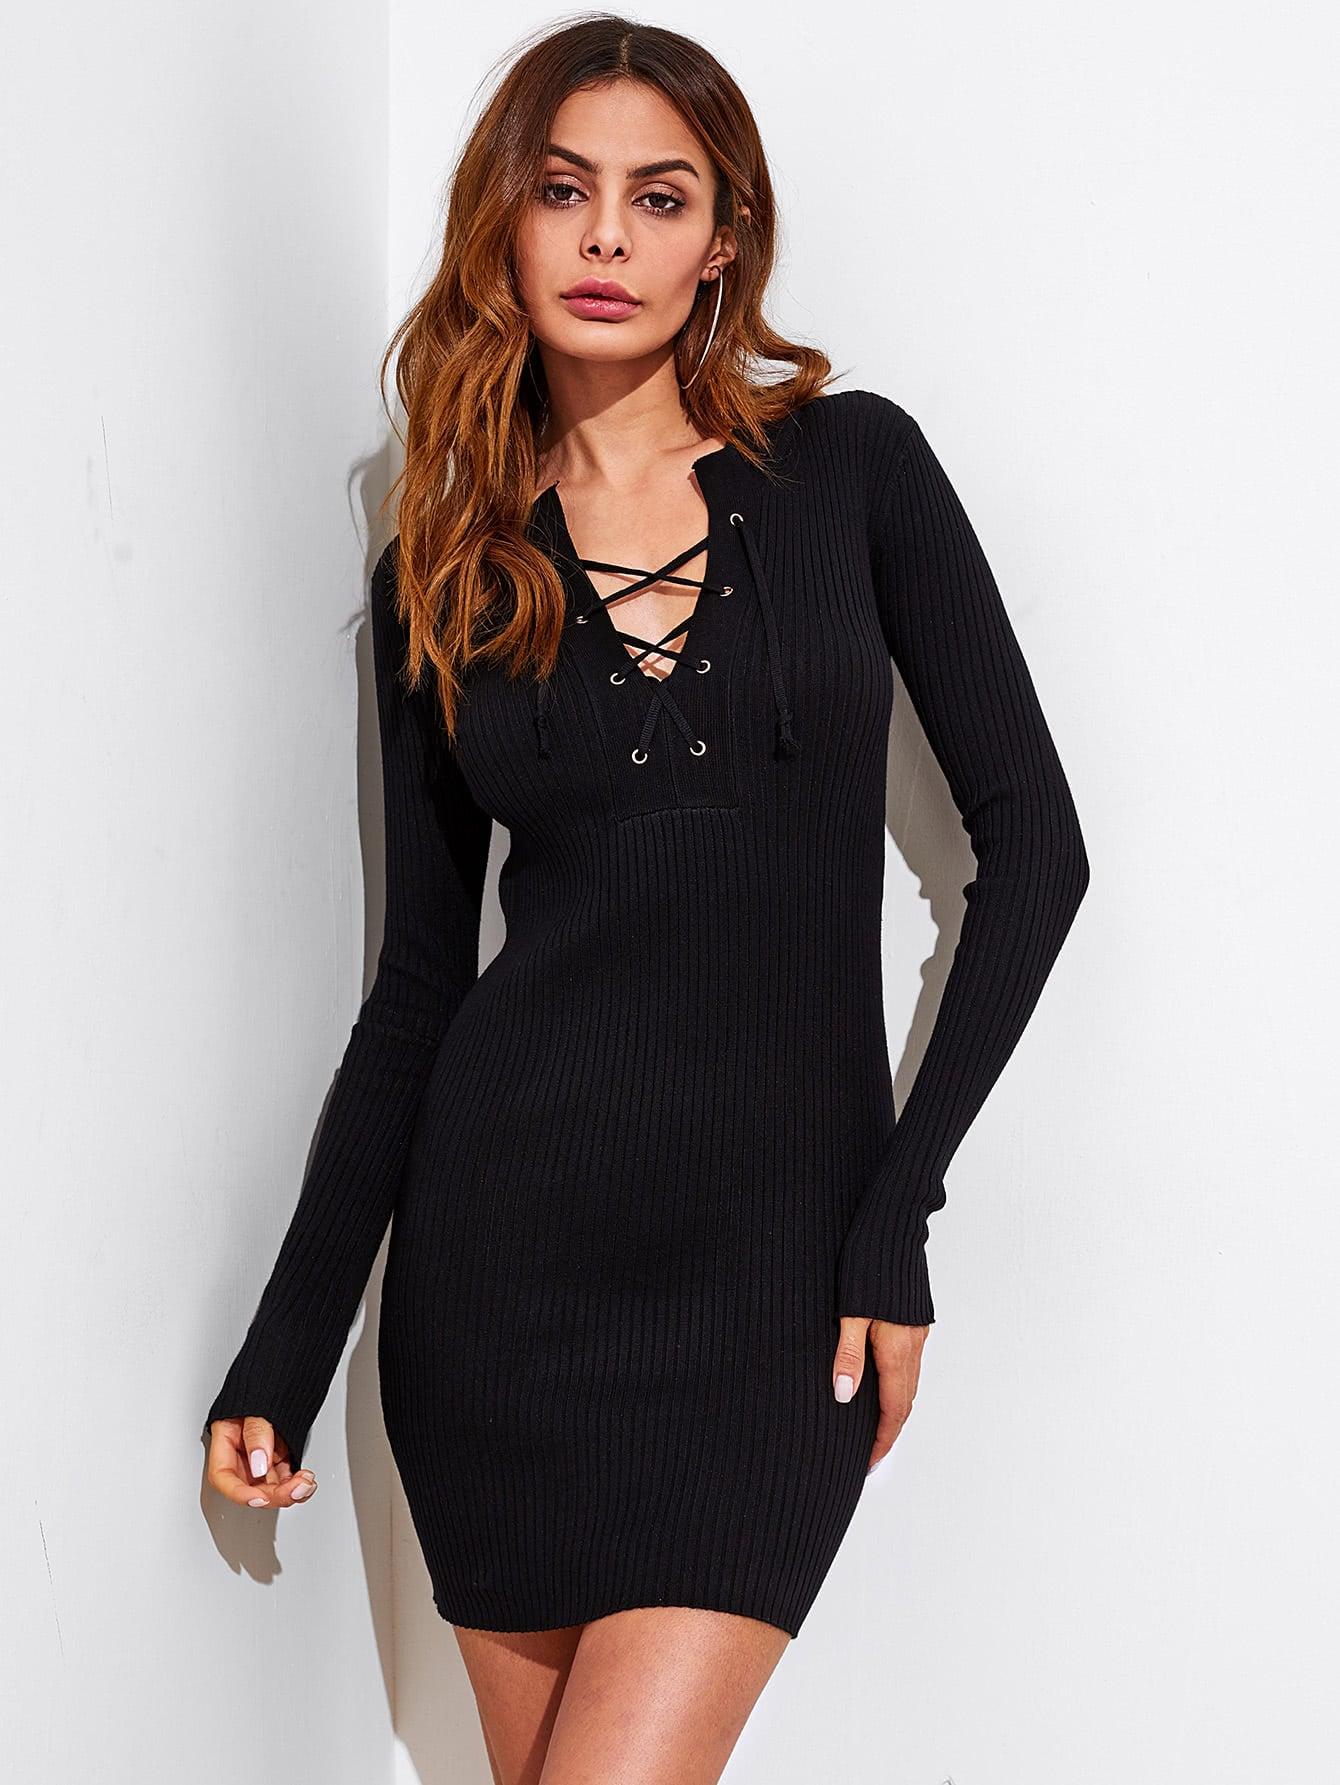 Eyelet Lace Up V Neck Ribbed Trim Sweater Dress dress170811201